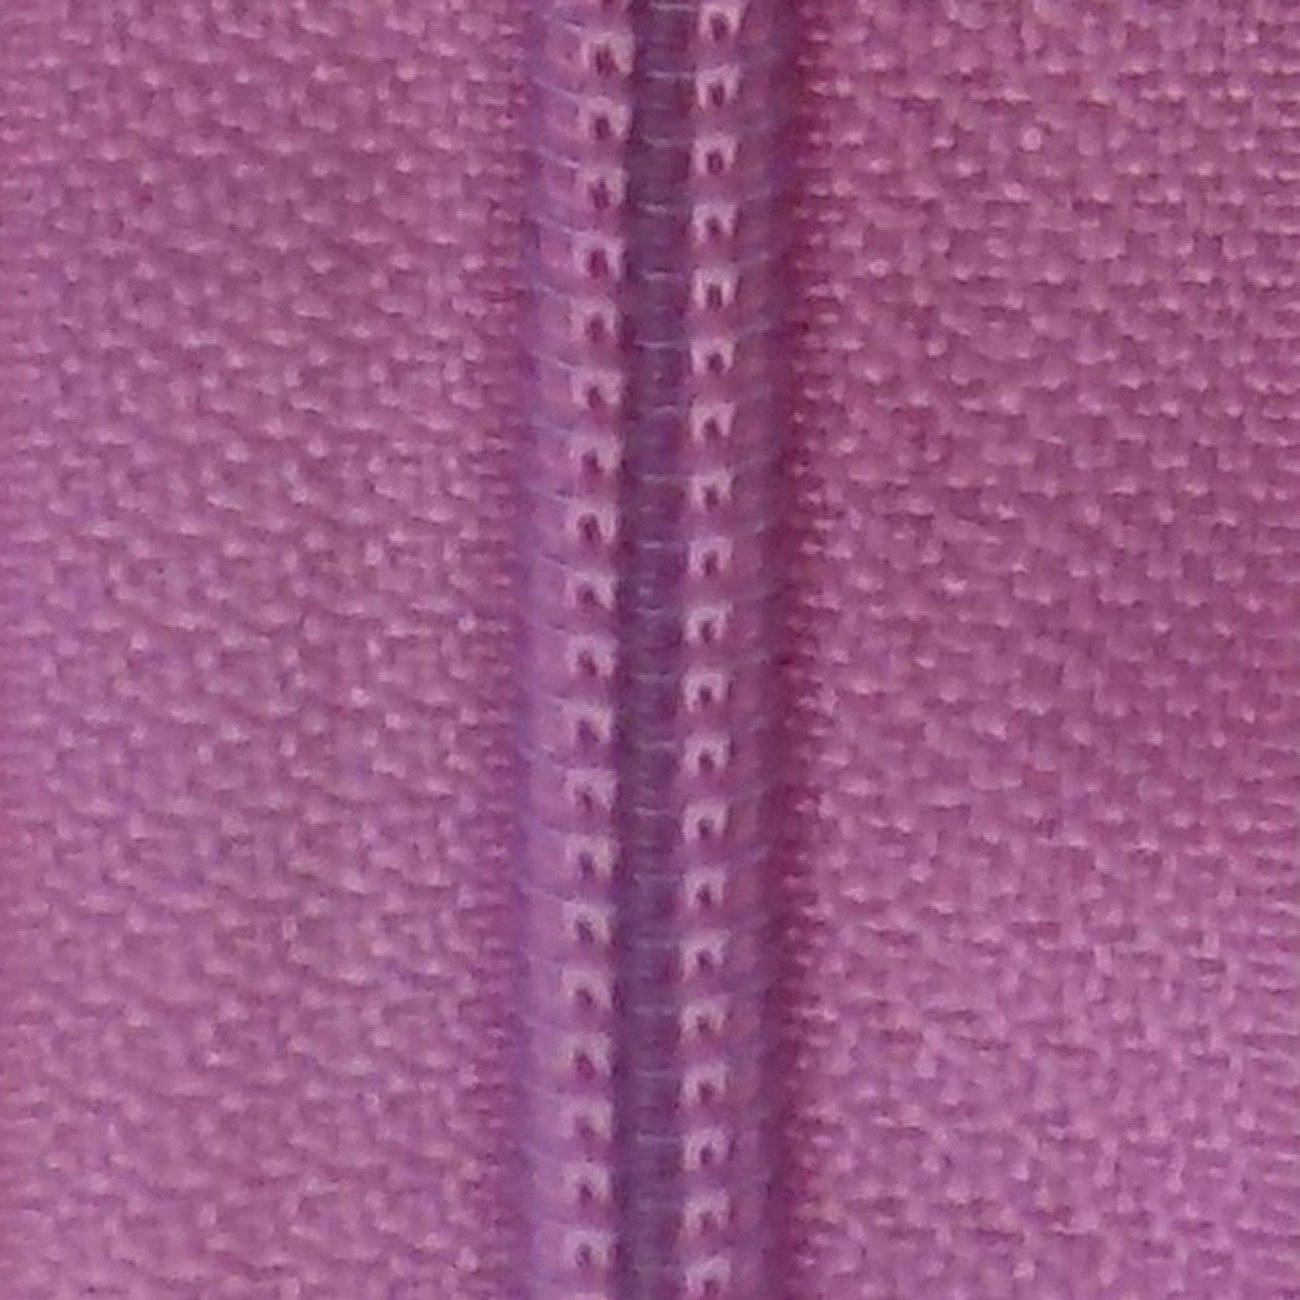 30 Double Pull Non Separating Zipper Cyclamen